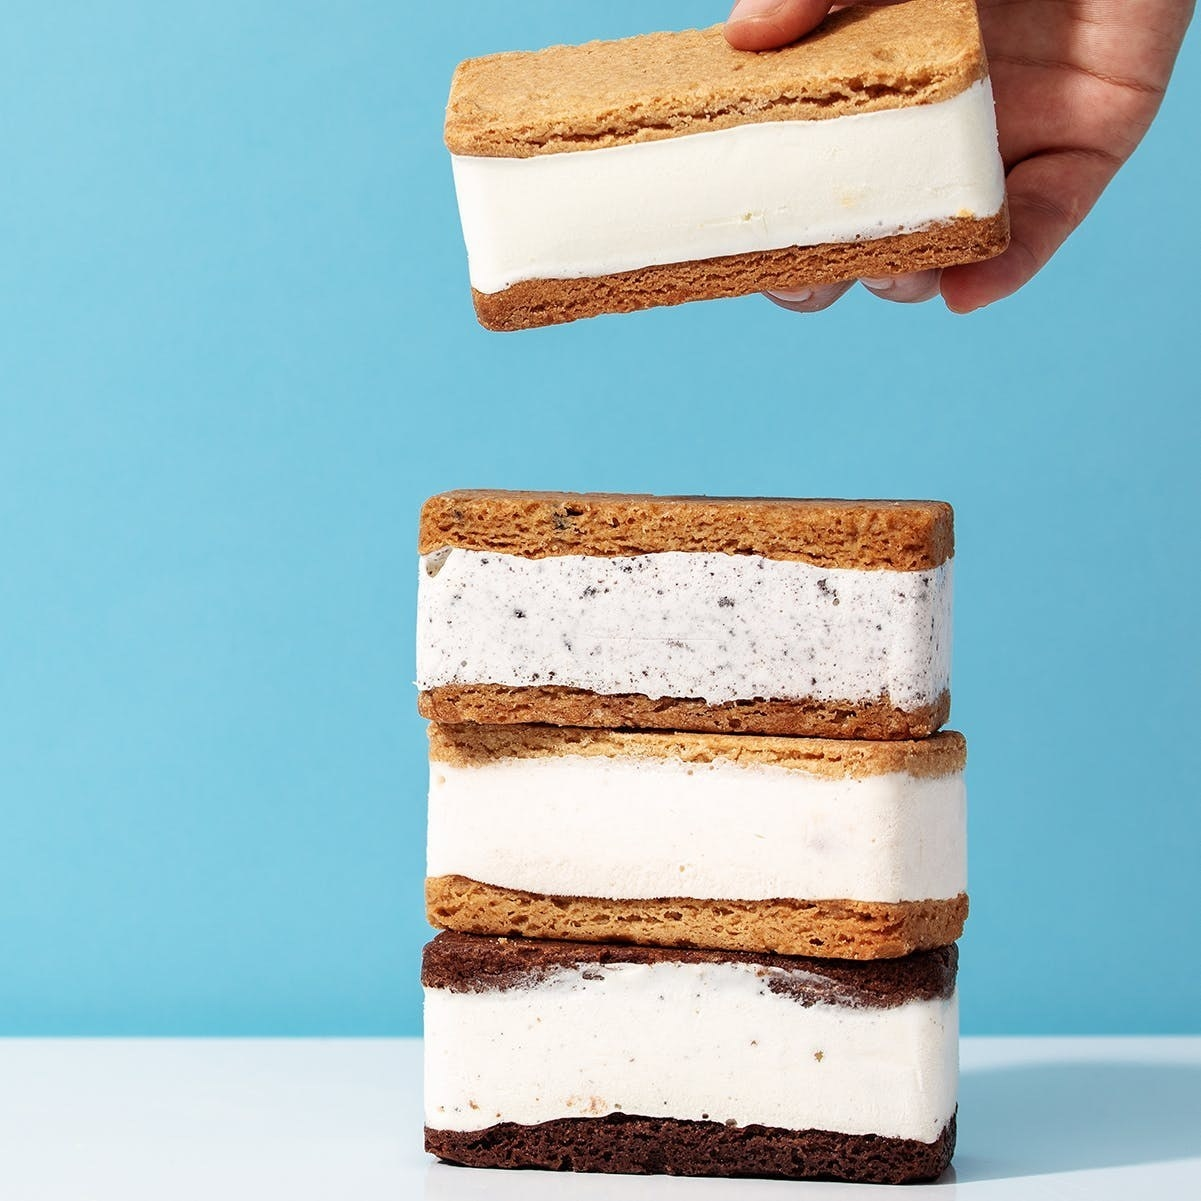 stack of ice cream sandwiches